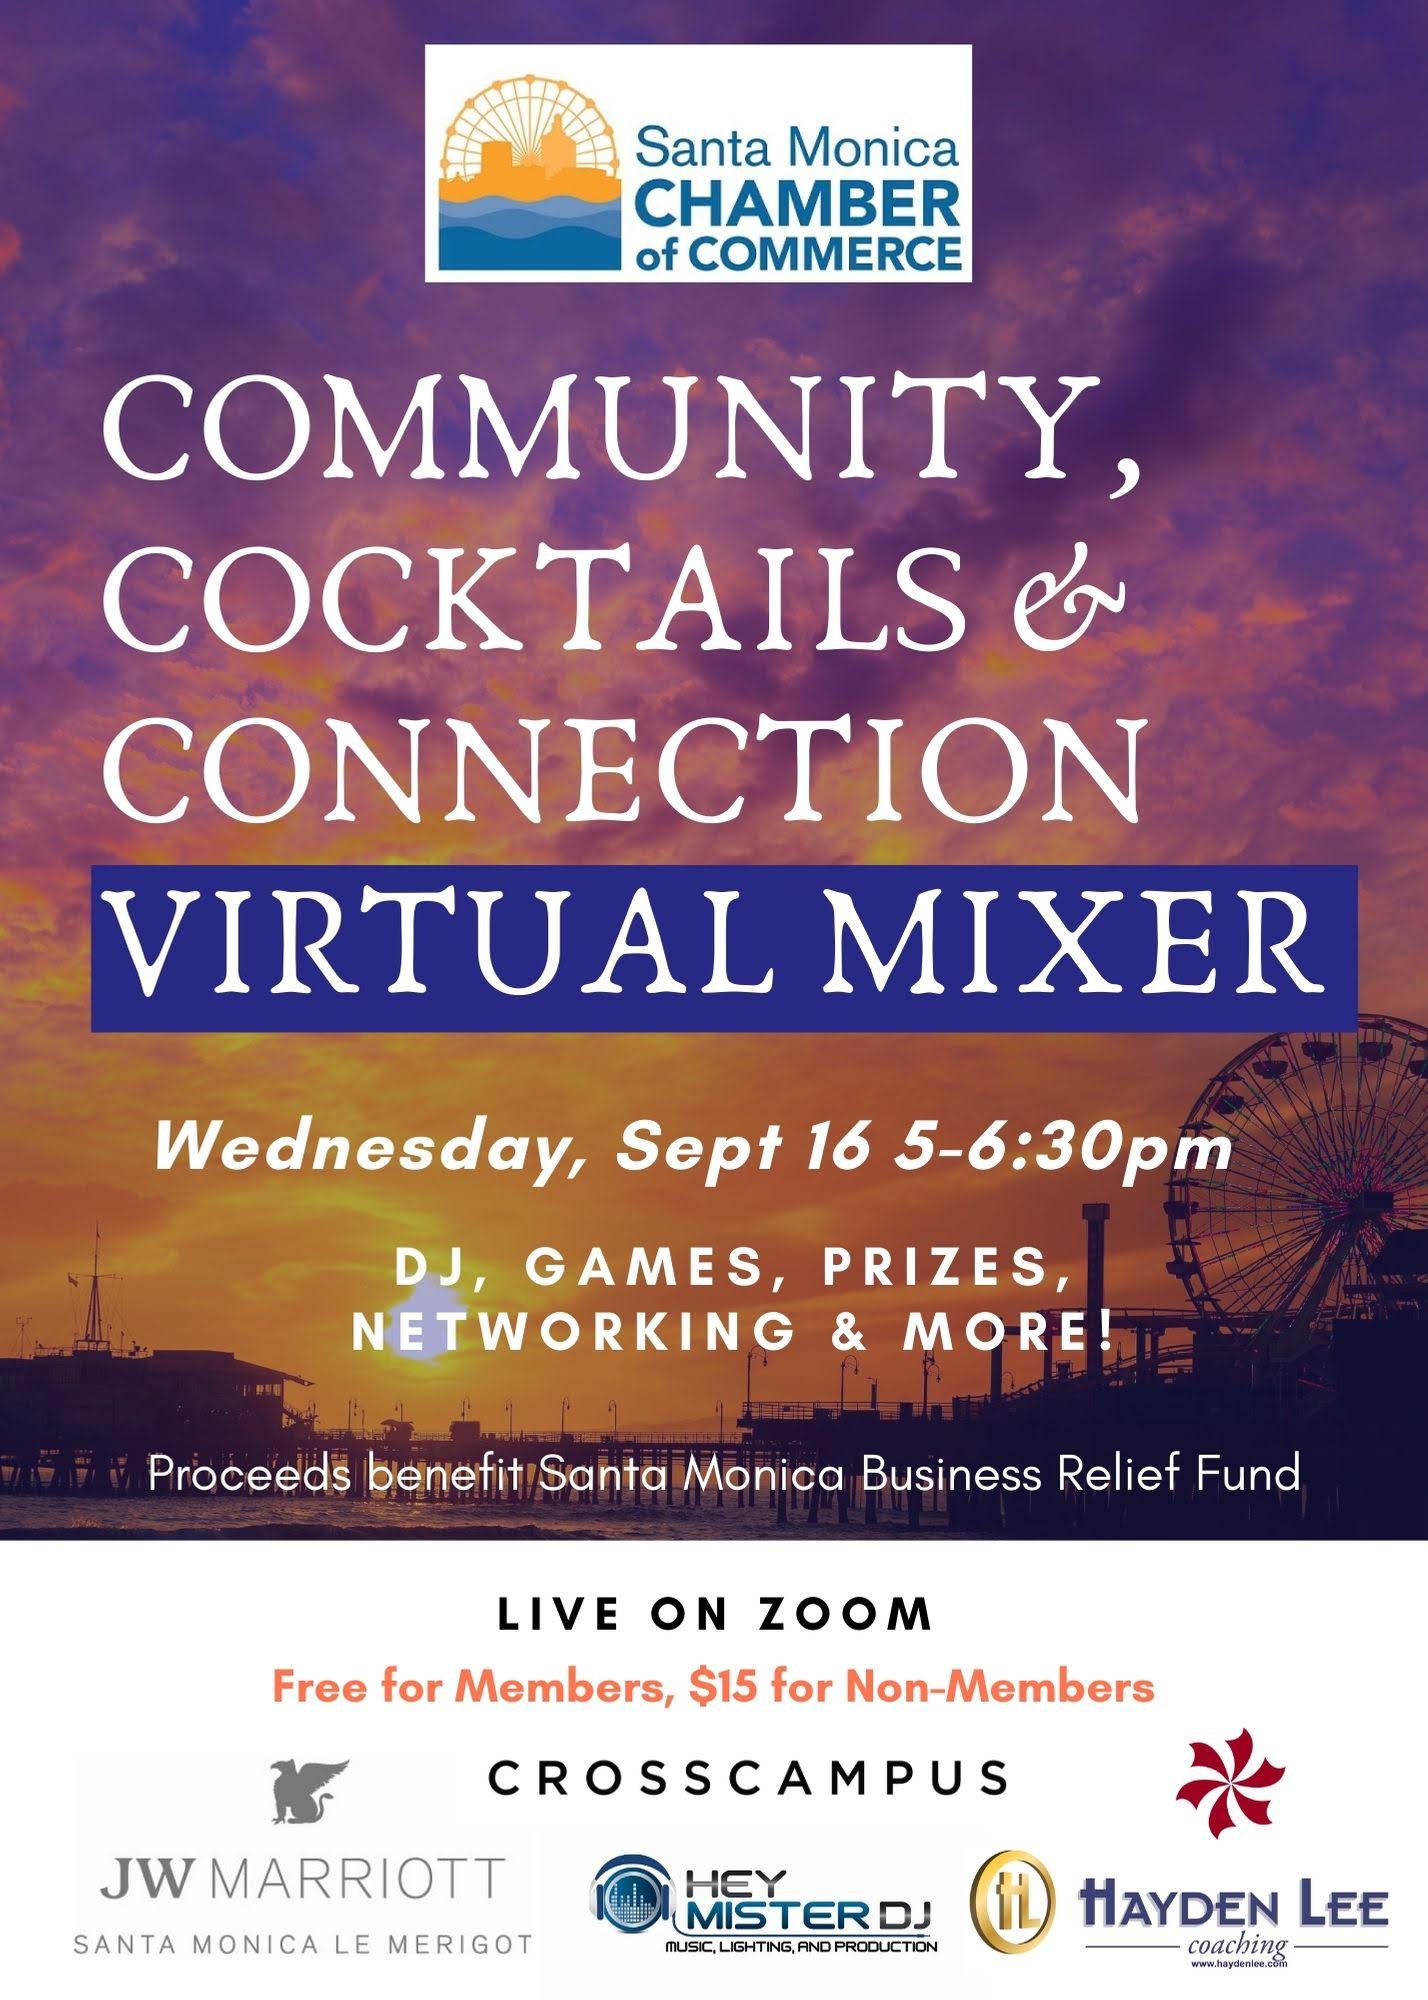 Santa Monica Chamber's Community, Cocktails & Connection Virtual Mixer